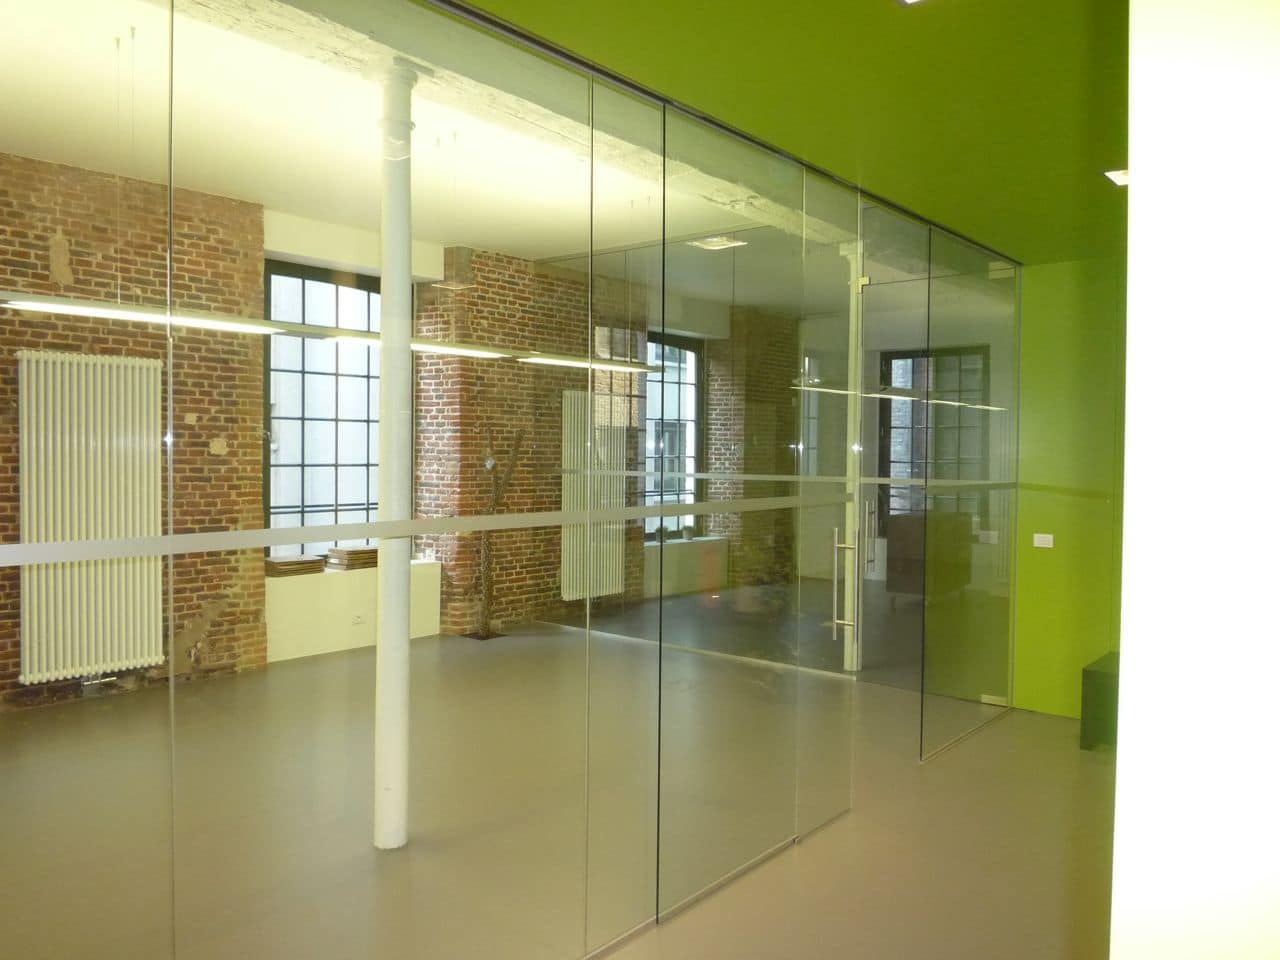 P1060760 | Baeyens & Beck architecten Gent | architect nieuwbouw renovatie interieur | high end | architectenbureau